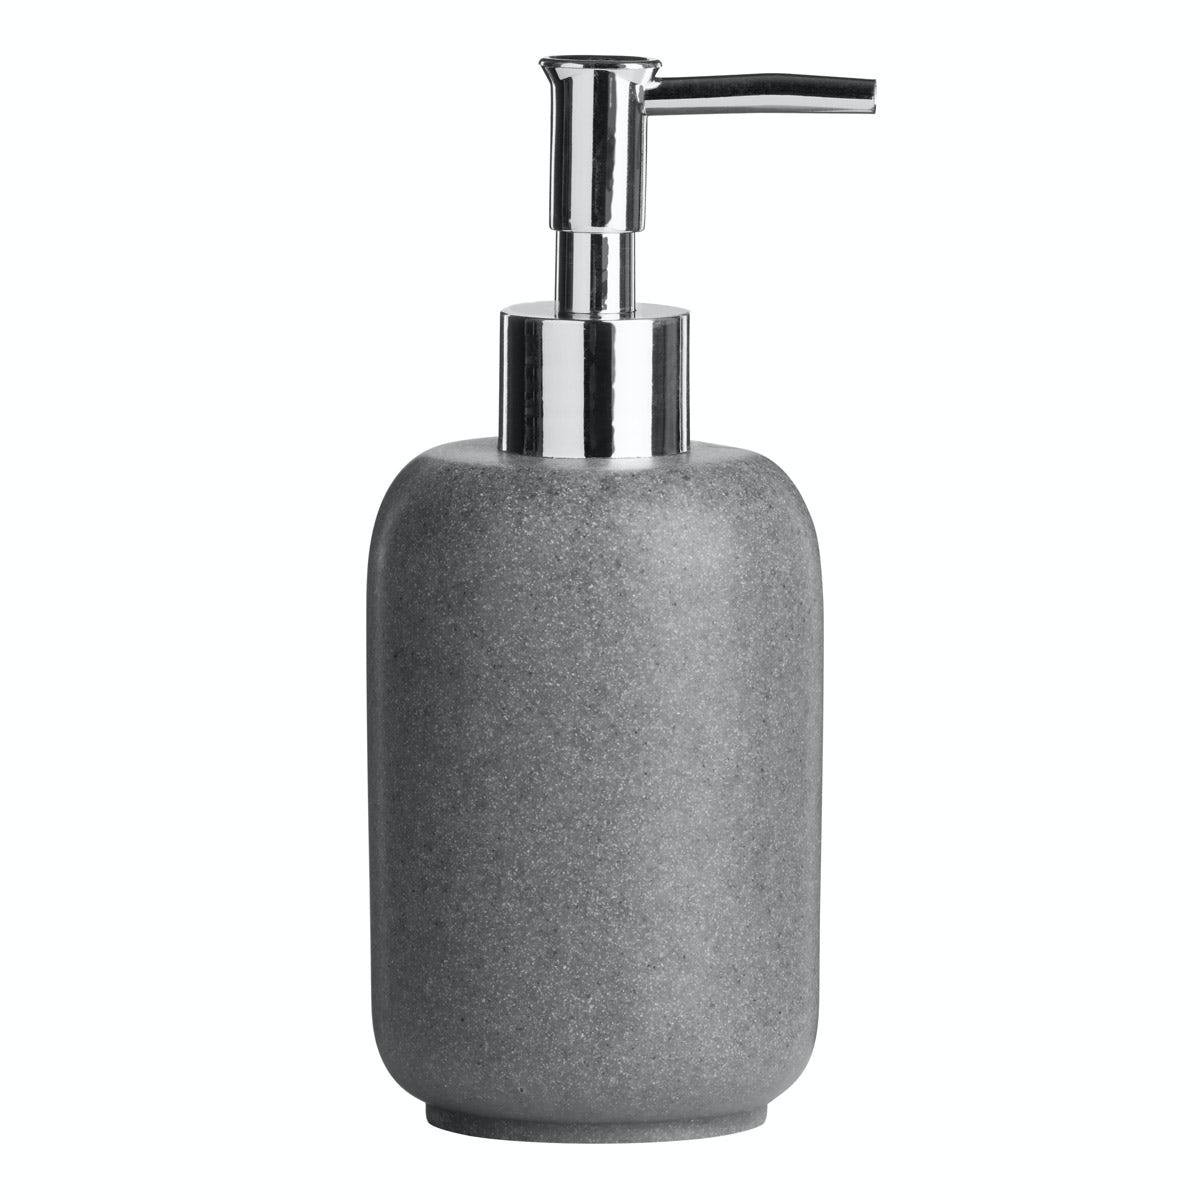 new accessories/soap dispenser